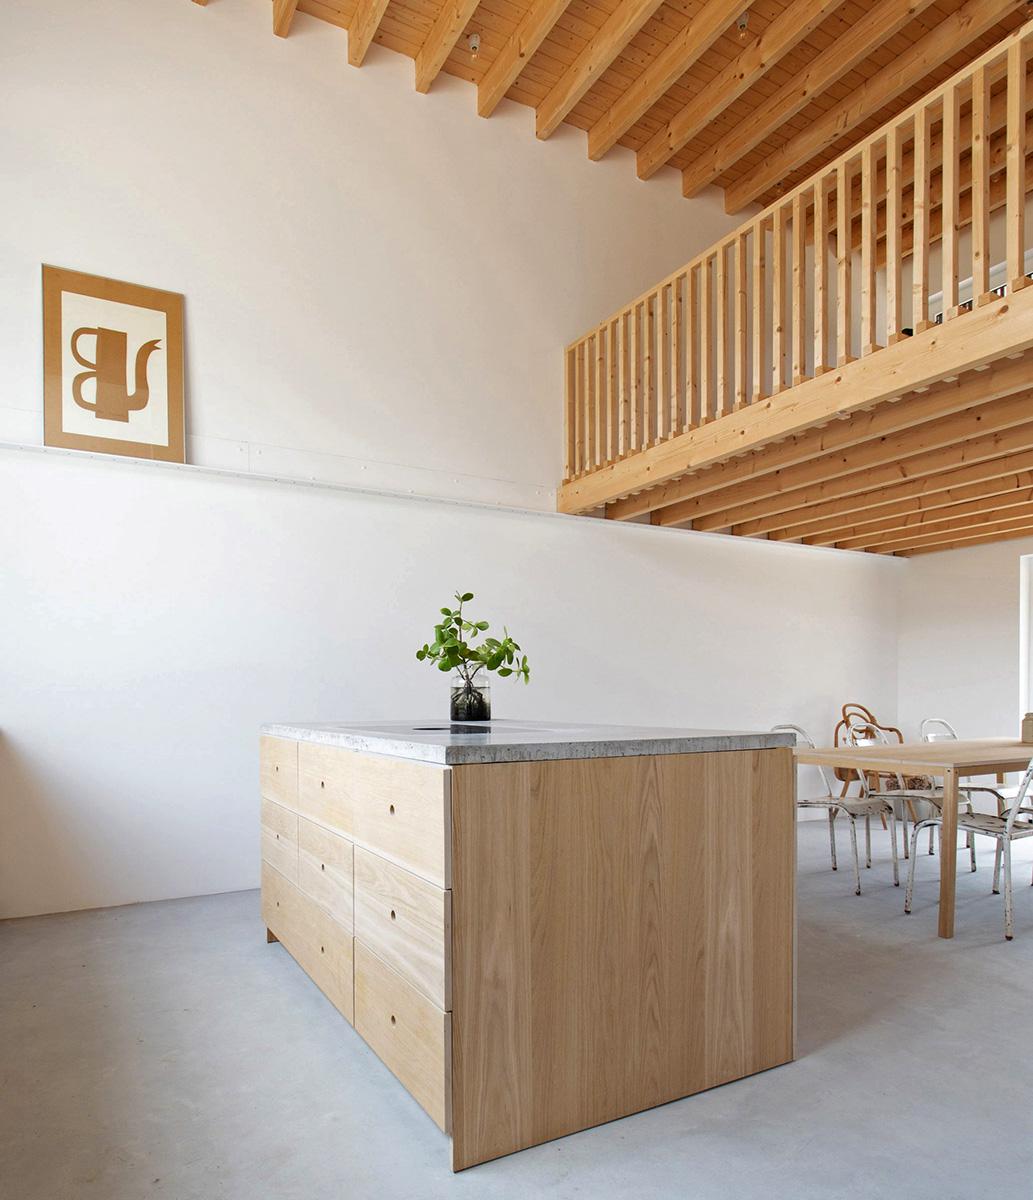 Rhythm-House-Julius-Taminiau-Architects-Norbert-Wunderling-03